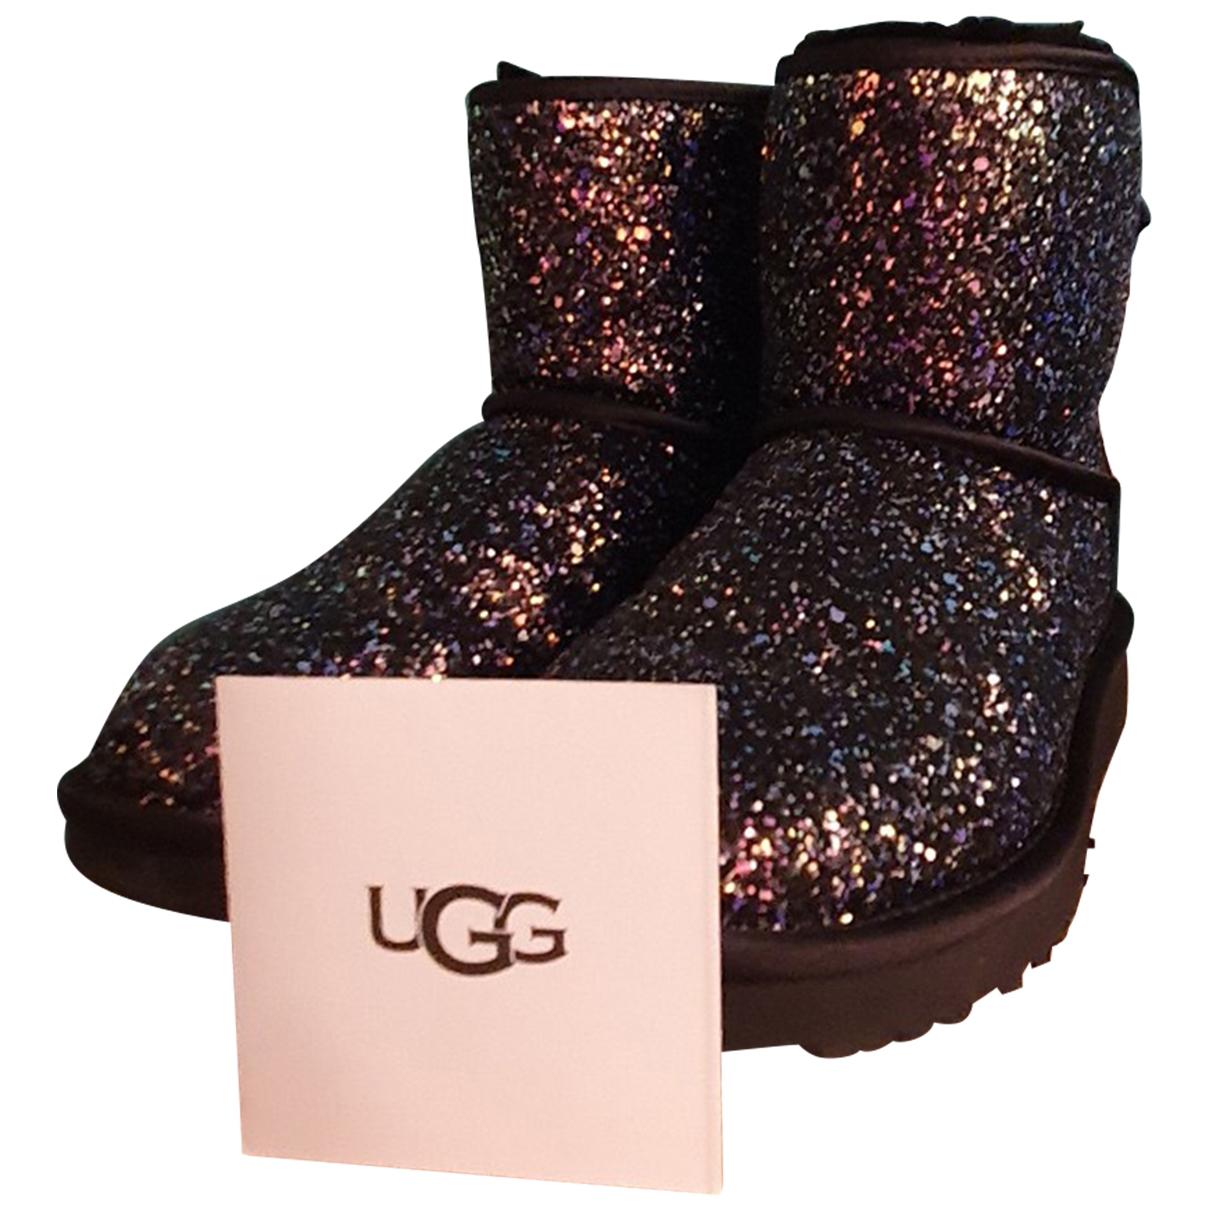 Ugg \N Multicolour Glitter Boots for Women 38 EU